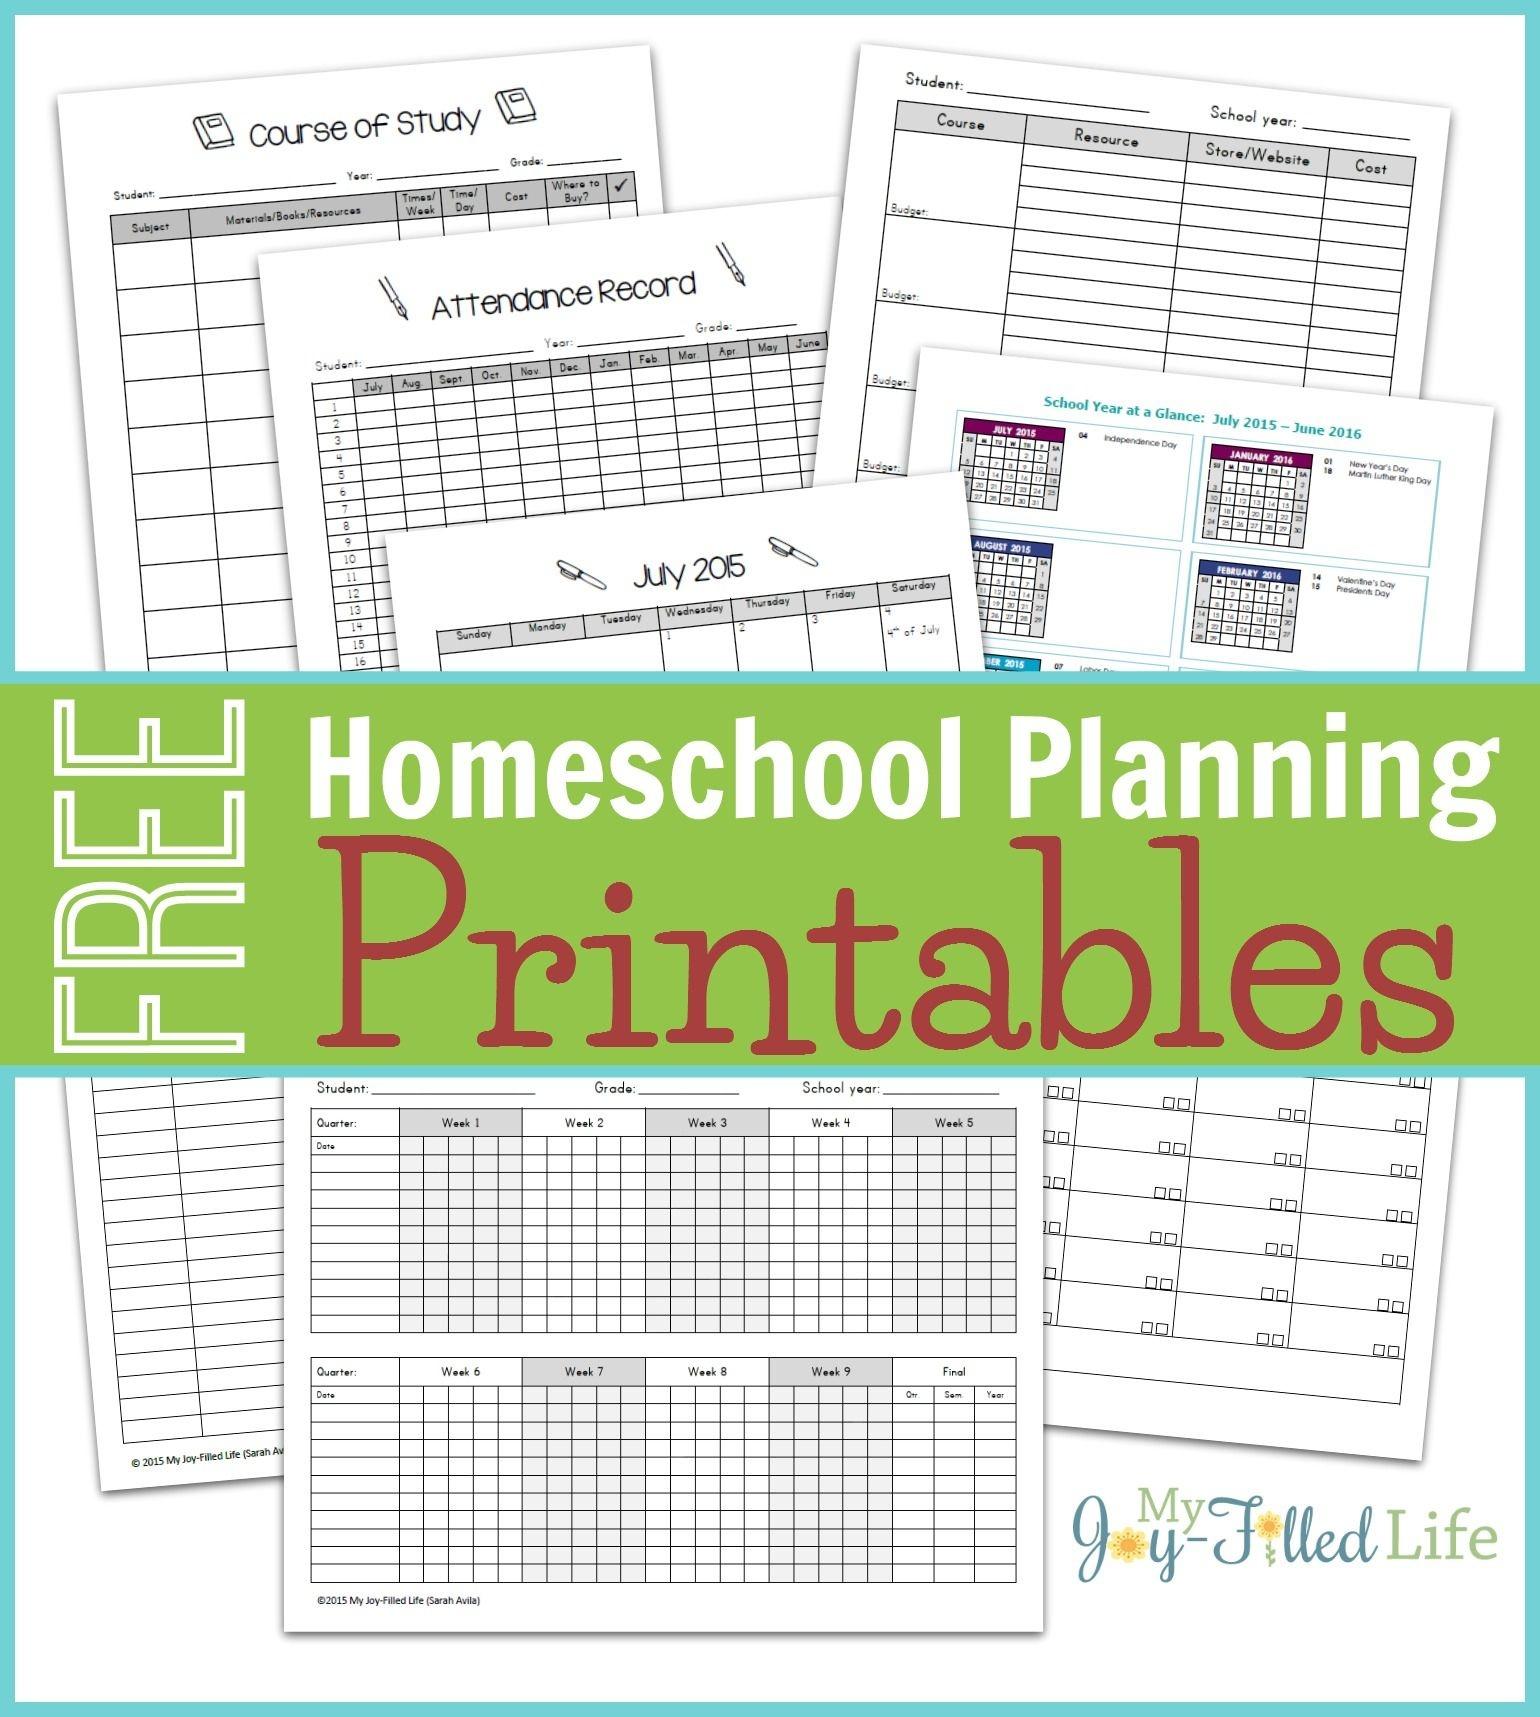 Homeschool Planning Resources & Free Printable Planning Pages - Free Printable Homeschool Curriculum